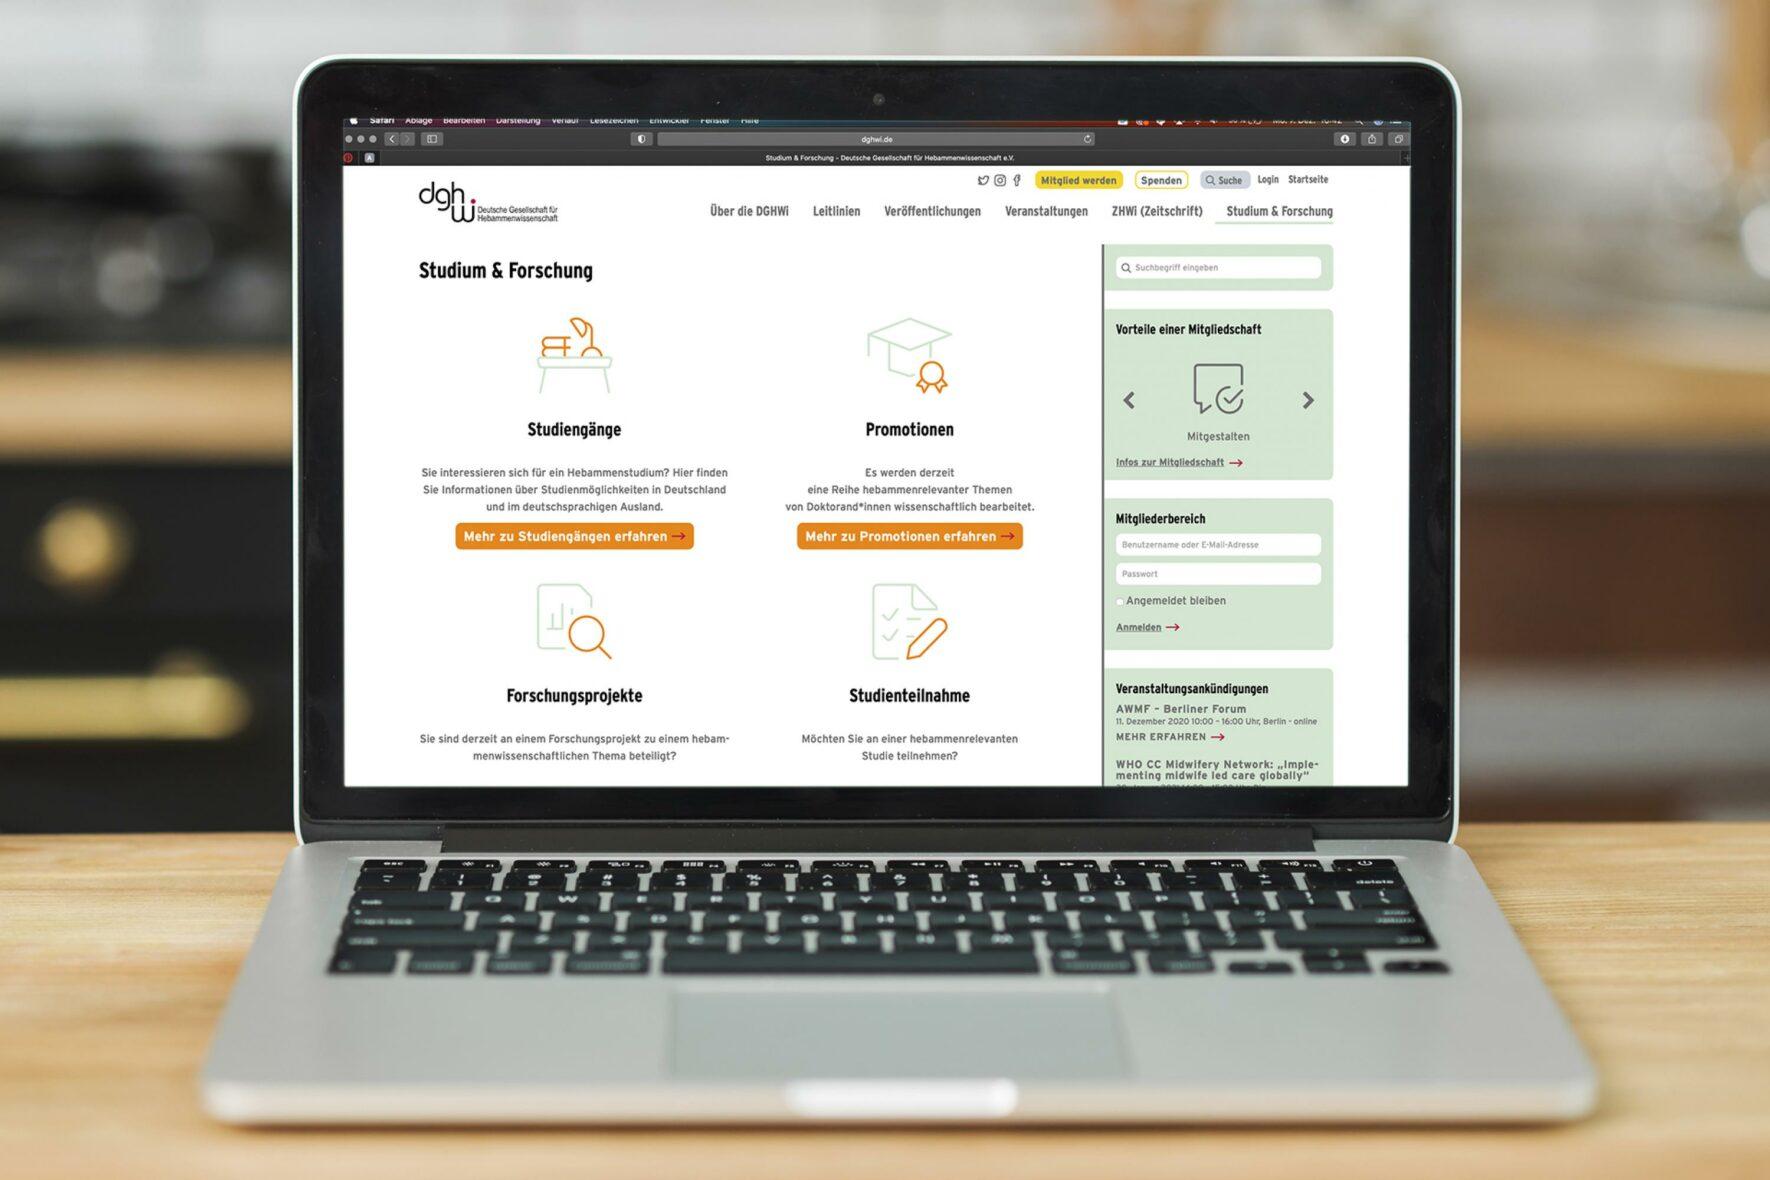 DGHWi-Deutsche Gesellschaft-fuer-Hebammenwissenschaft-Webdesign-Website-FORMLOS-Berlin-desktop